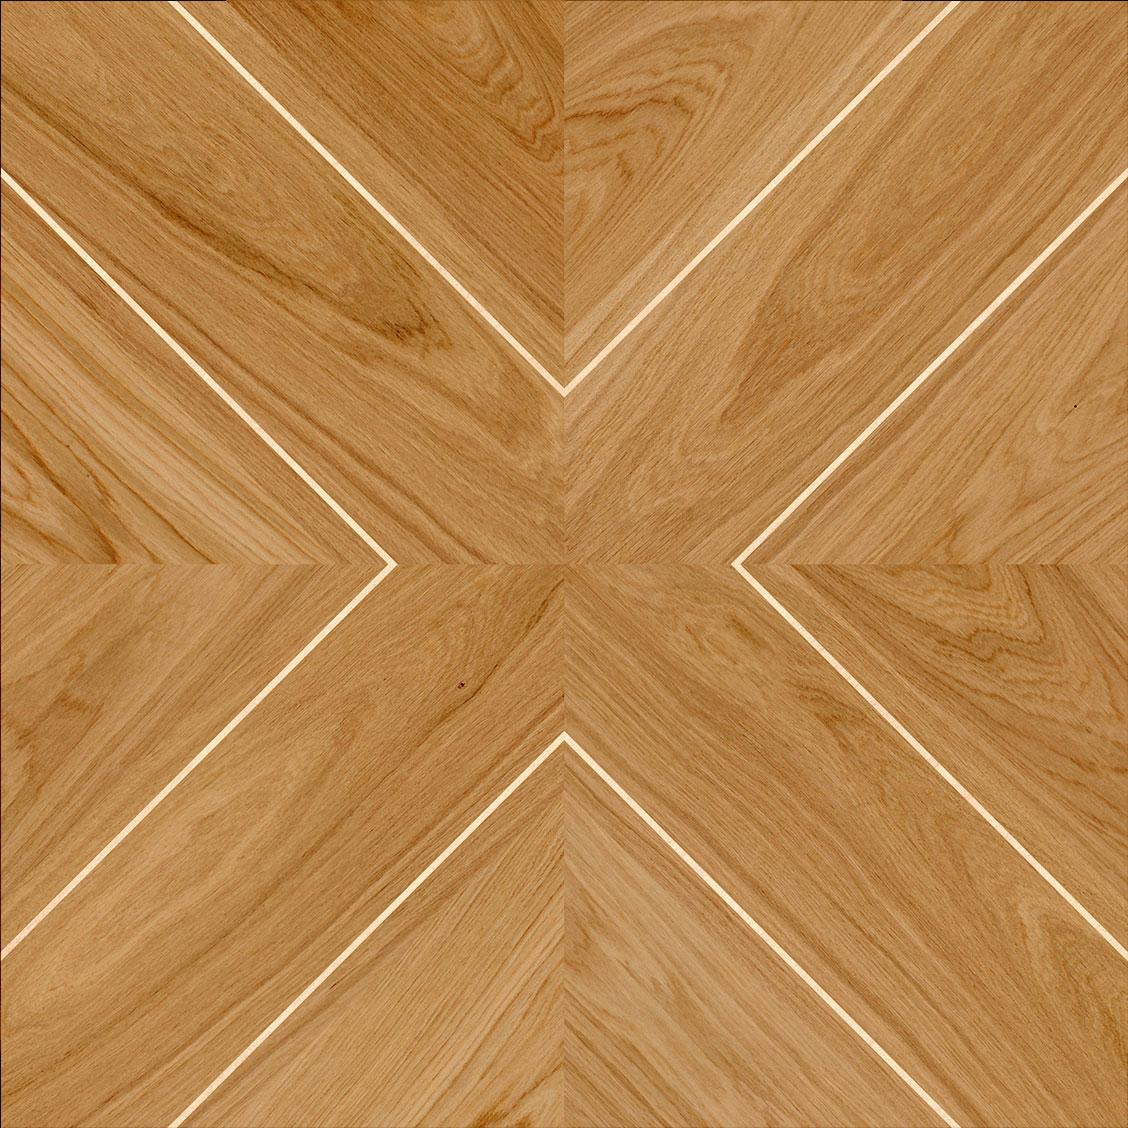 Tafelboden Muster